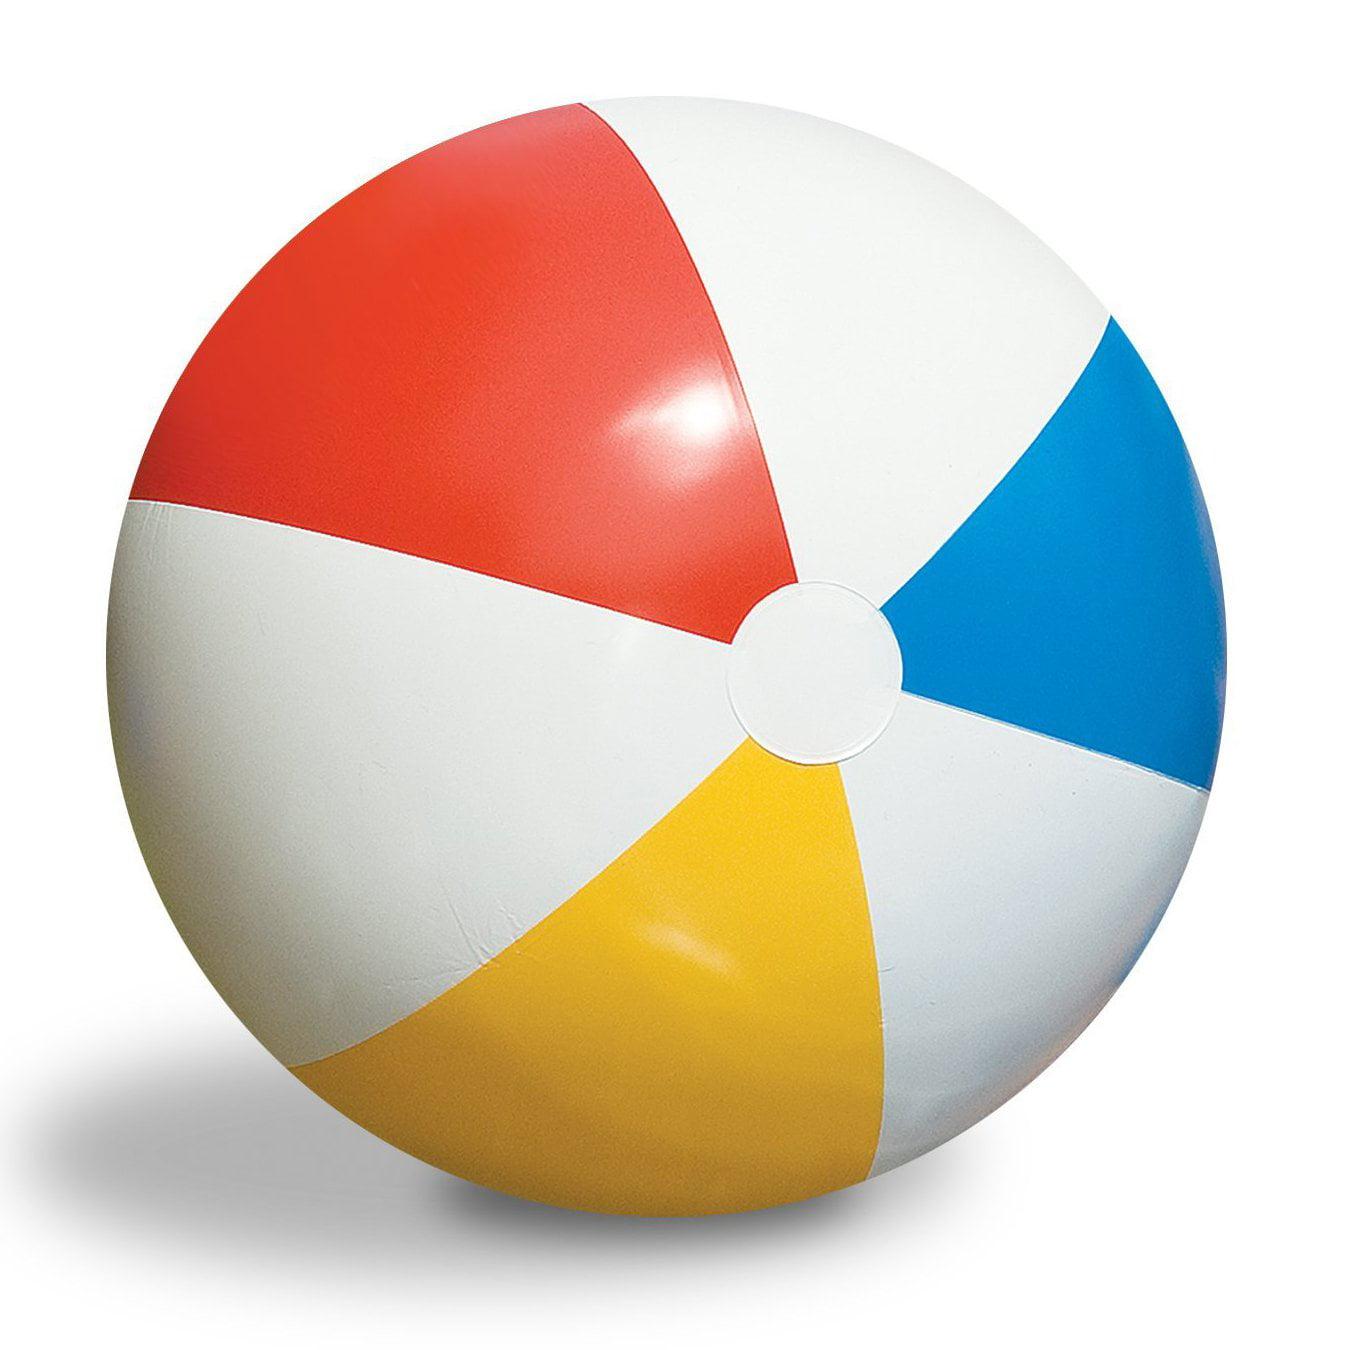 beach ball image - HD1350×1350